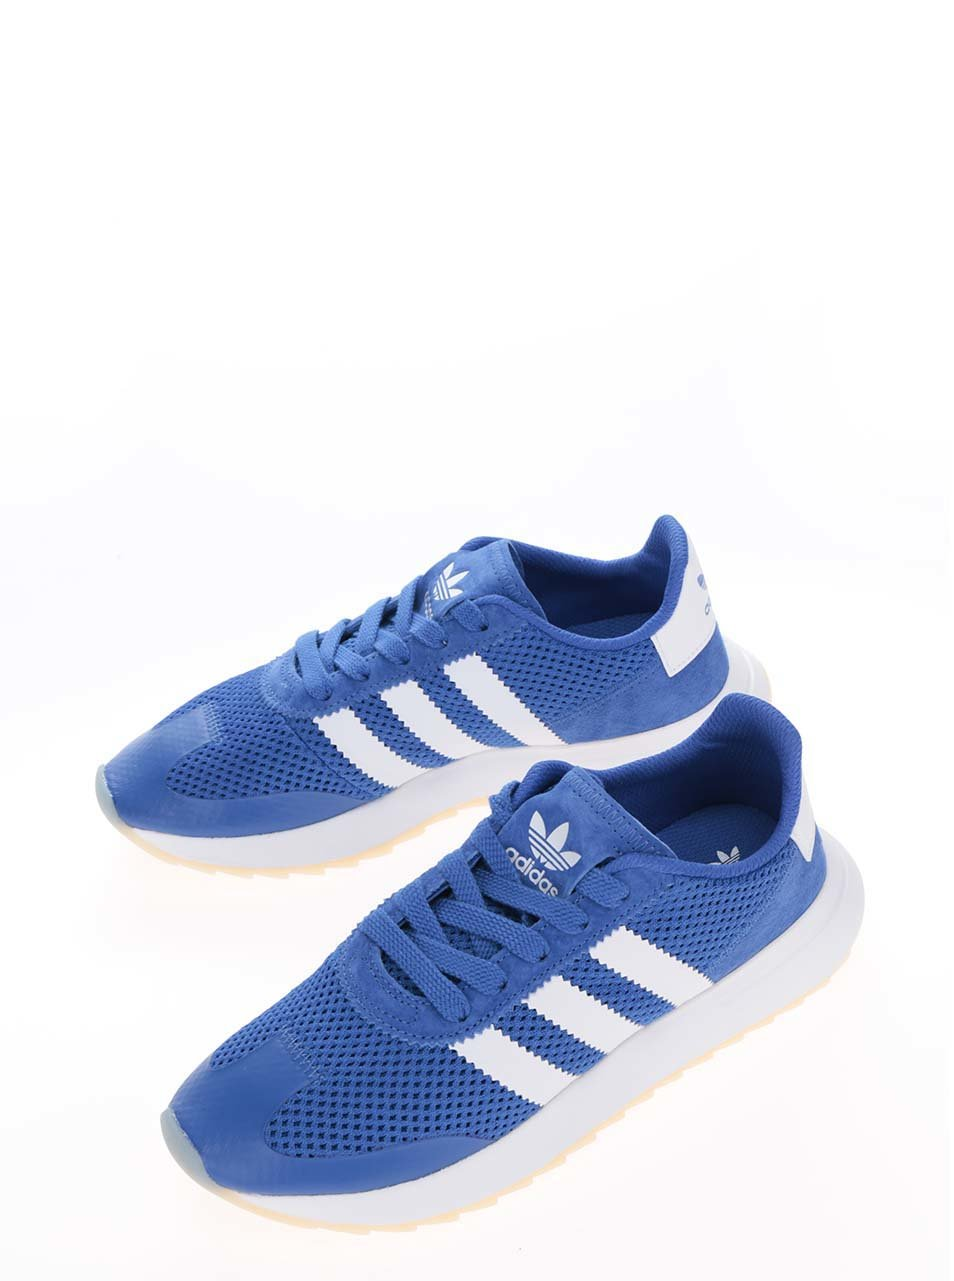 Modré dámské tenisky adidas Originals Flashrunner ... edf66ad991f